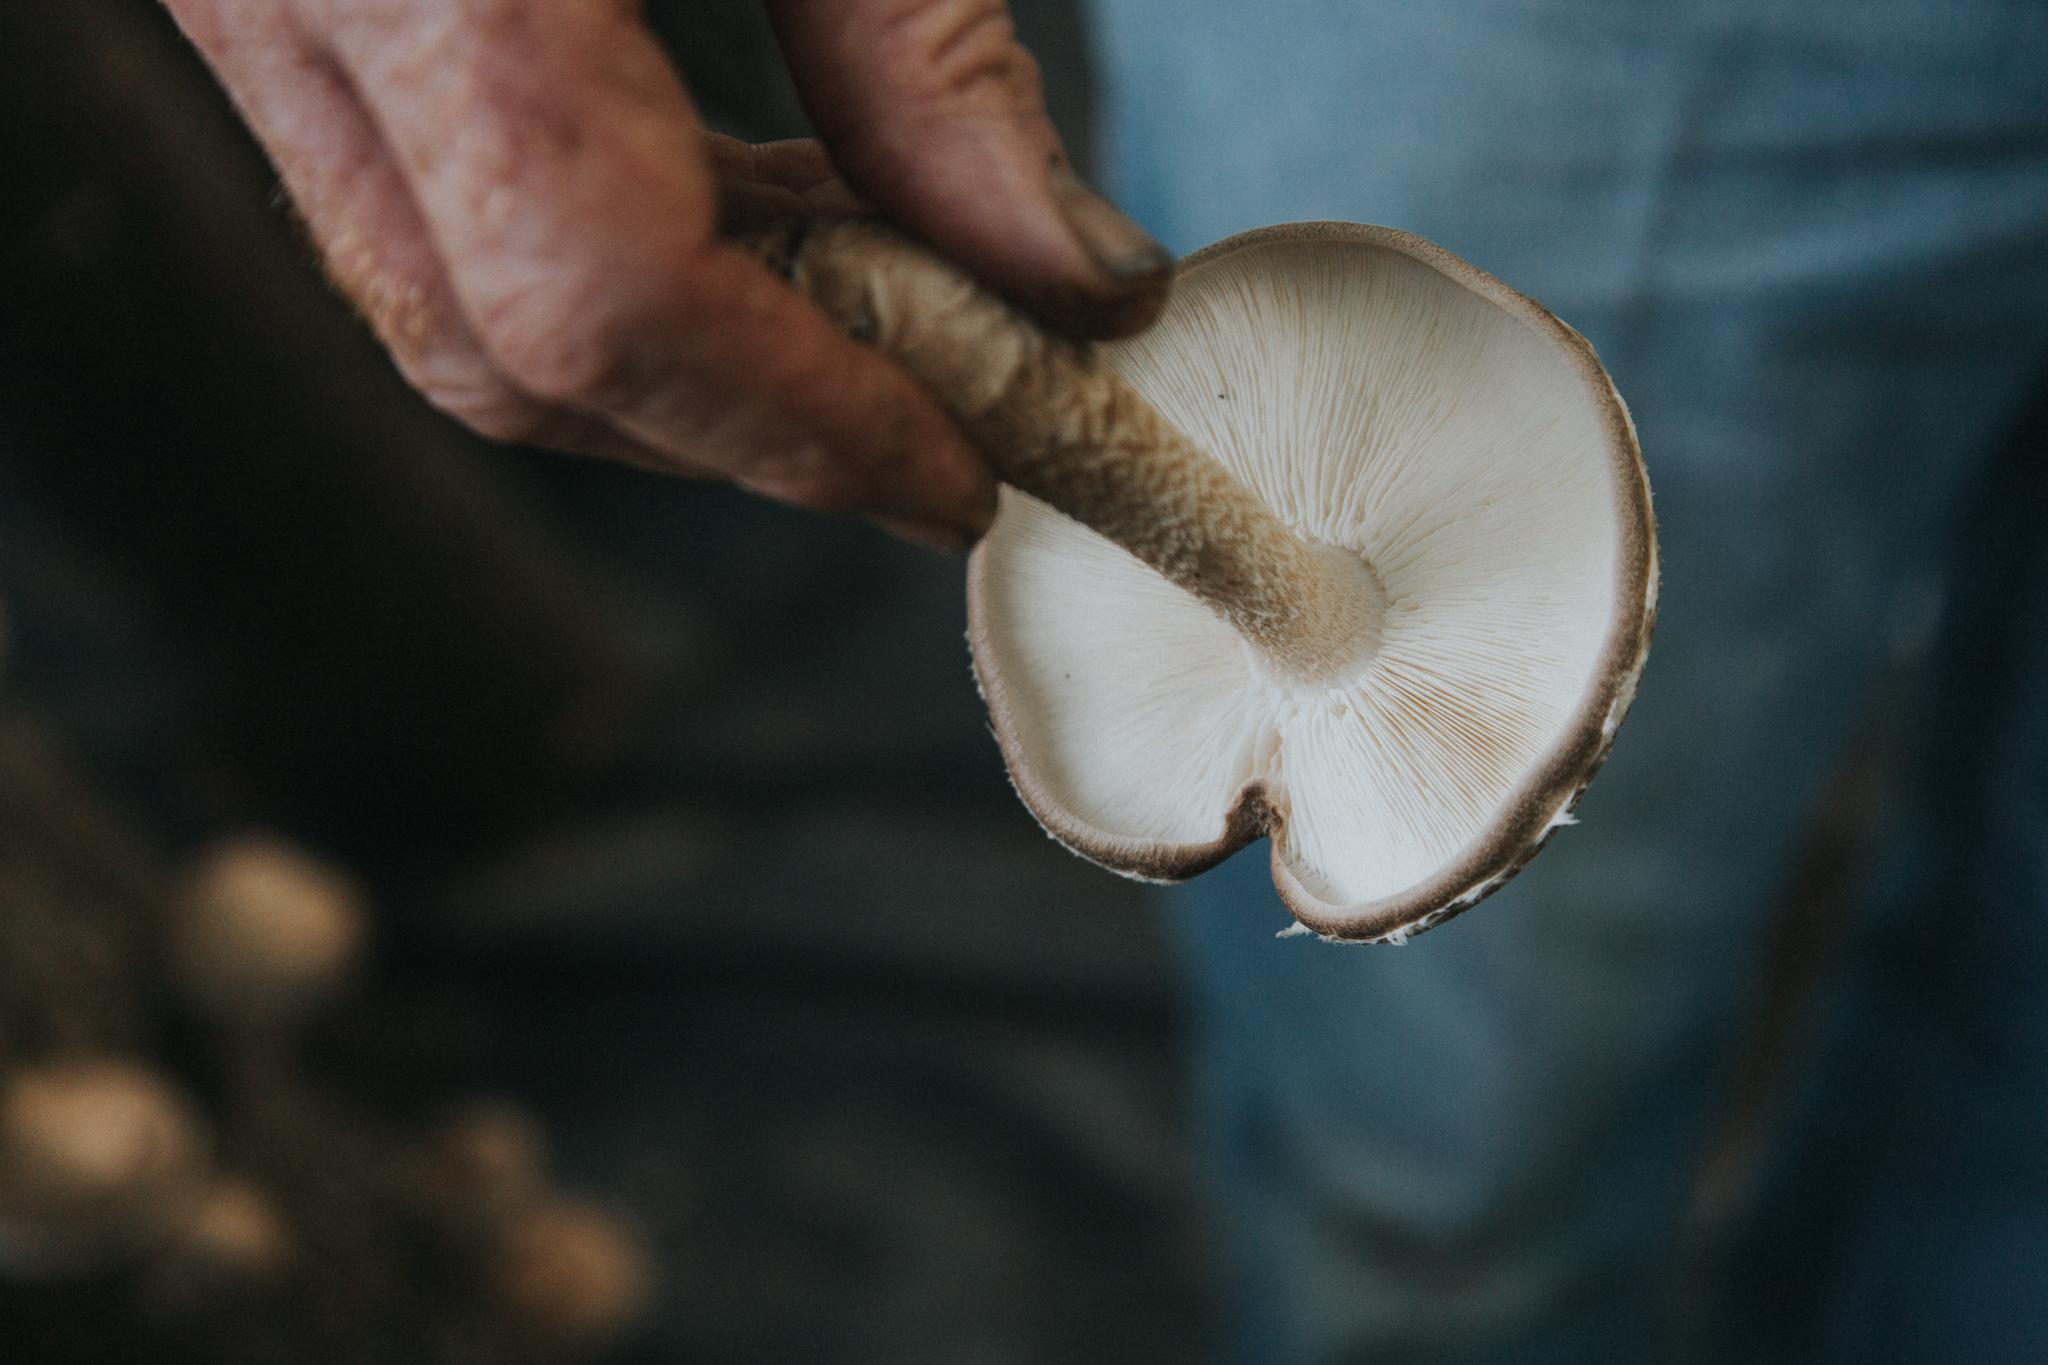 SG6-Mushroom-Farm-Olivia-Siegel-8.jpg